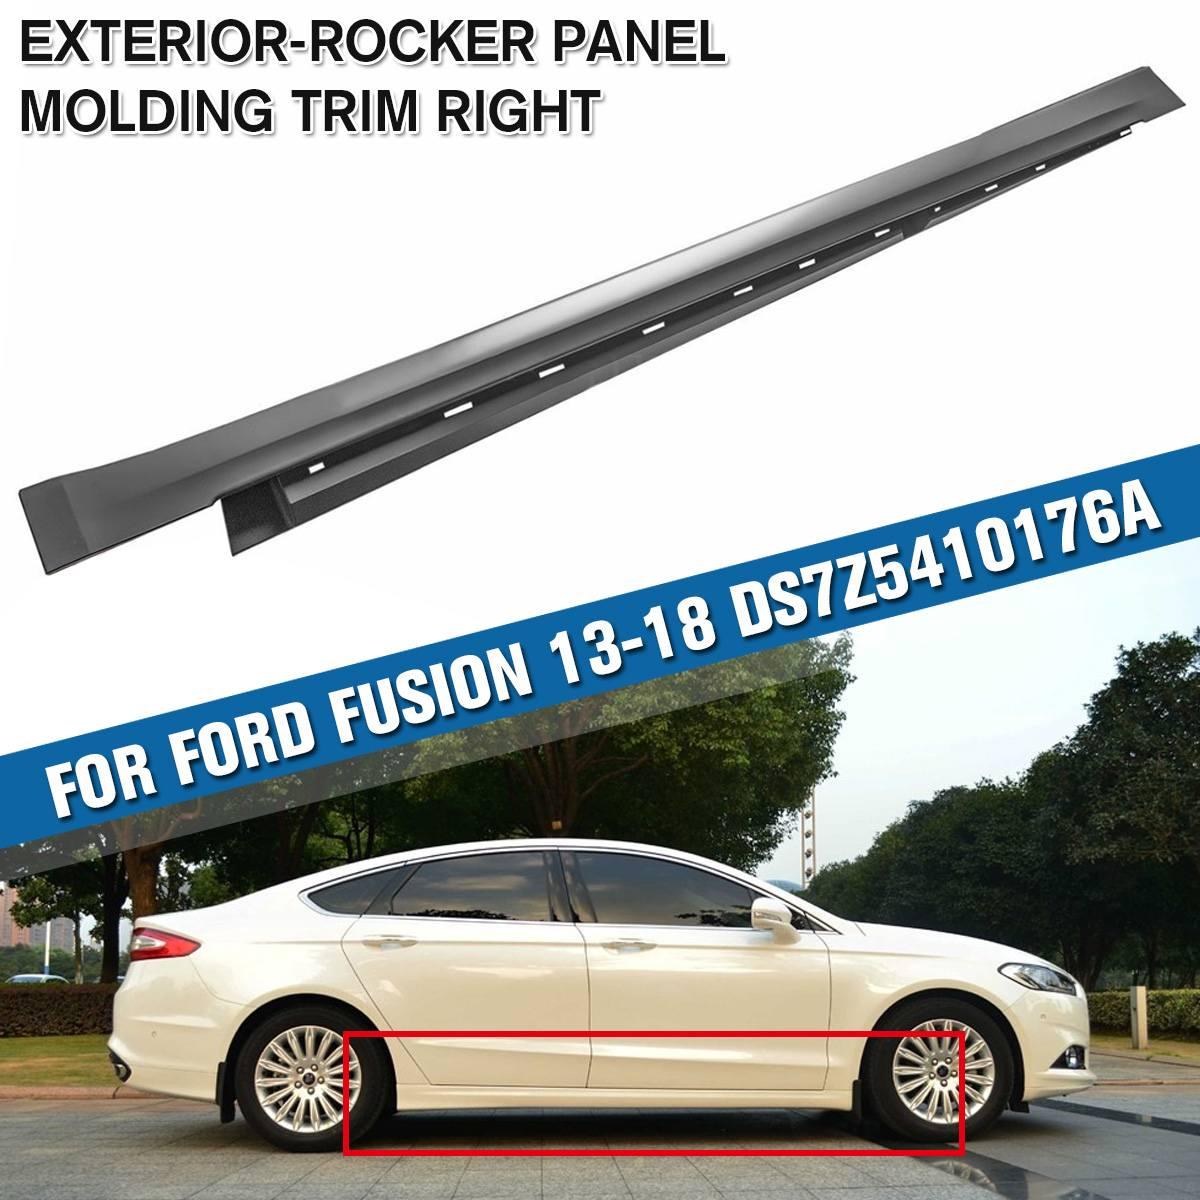 NEW Exterior Rocker Panel Molding Trim Right Door Pillar Trim For FORD FUSION 2013 2018 DS7Z5410176A